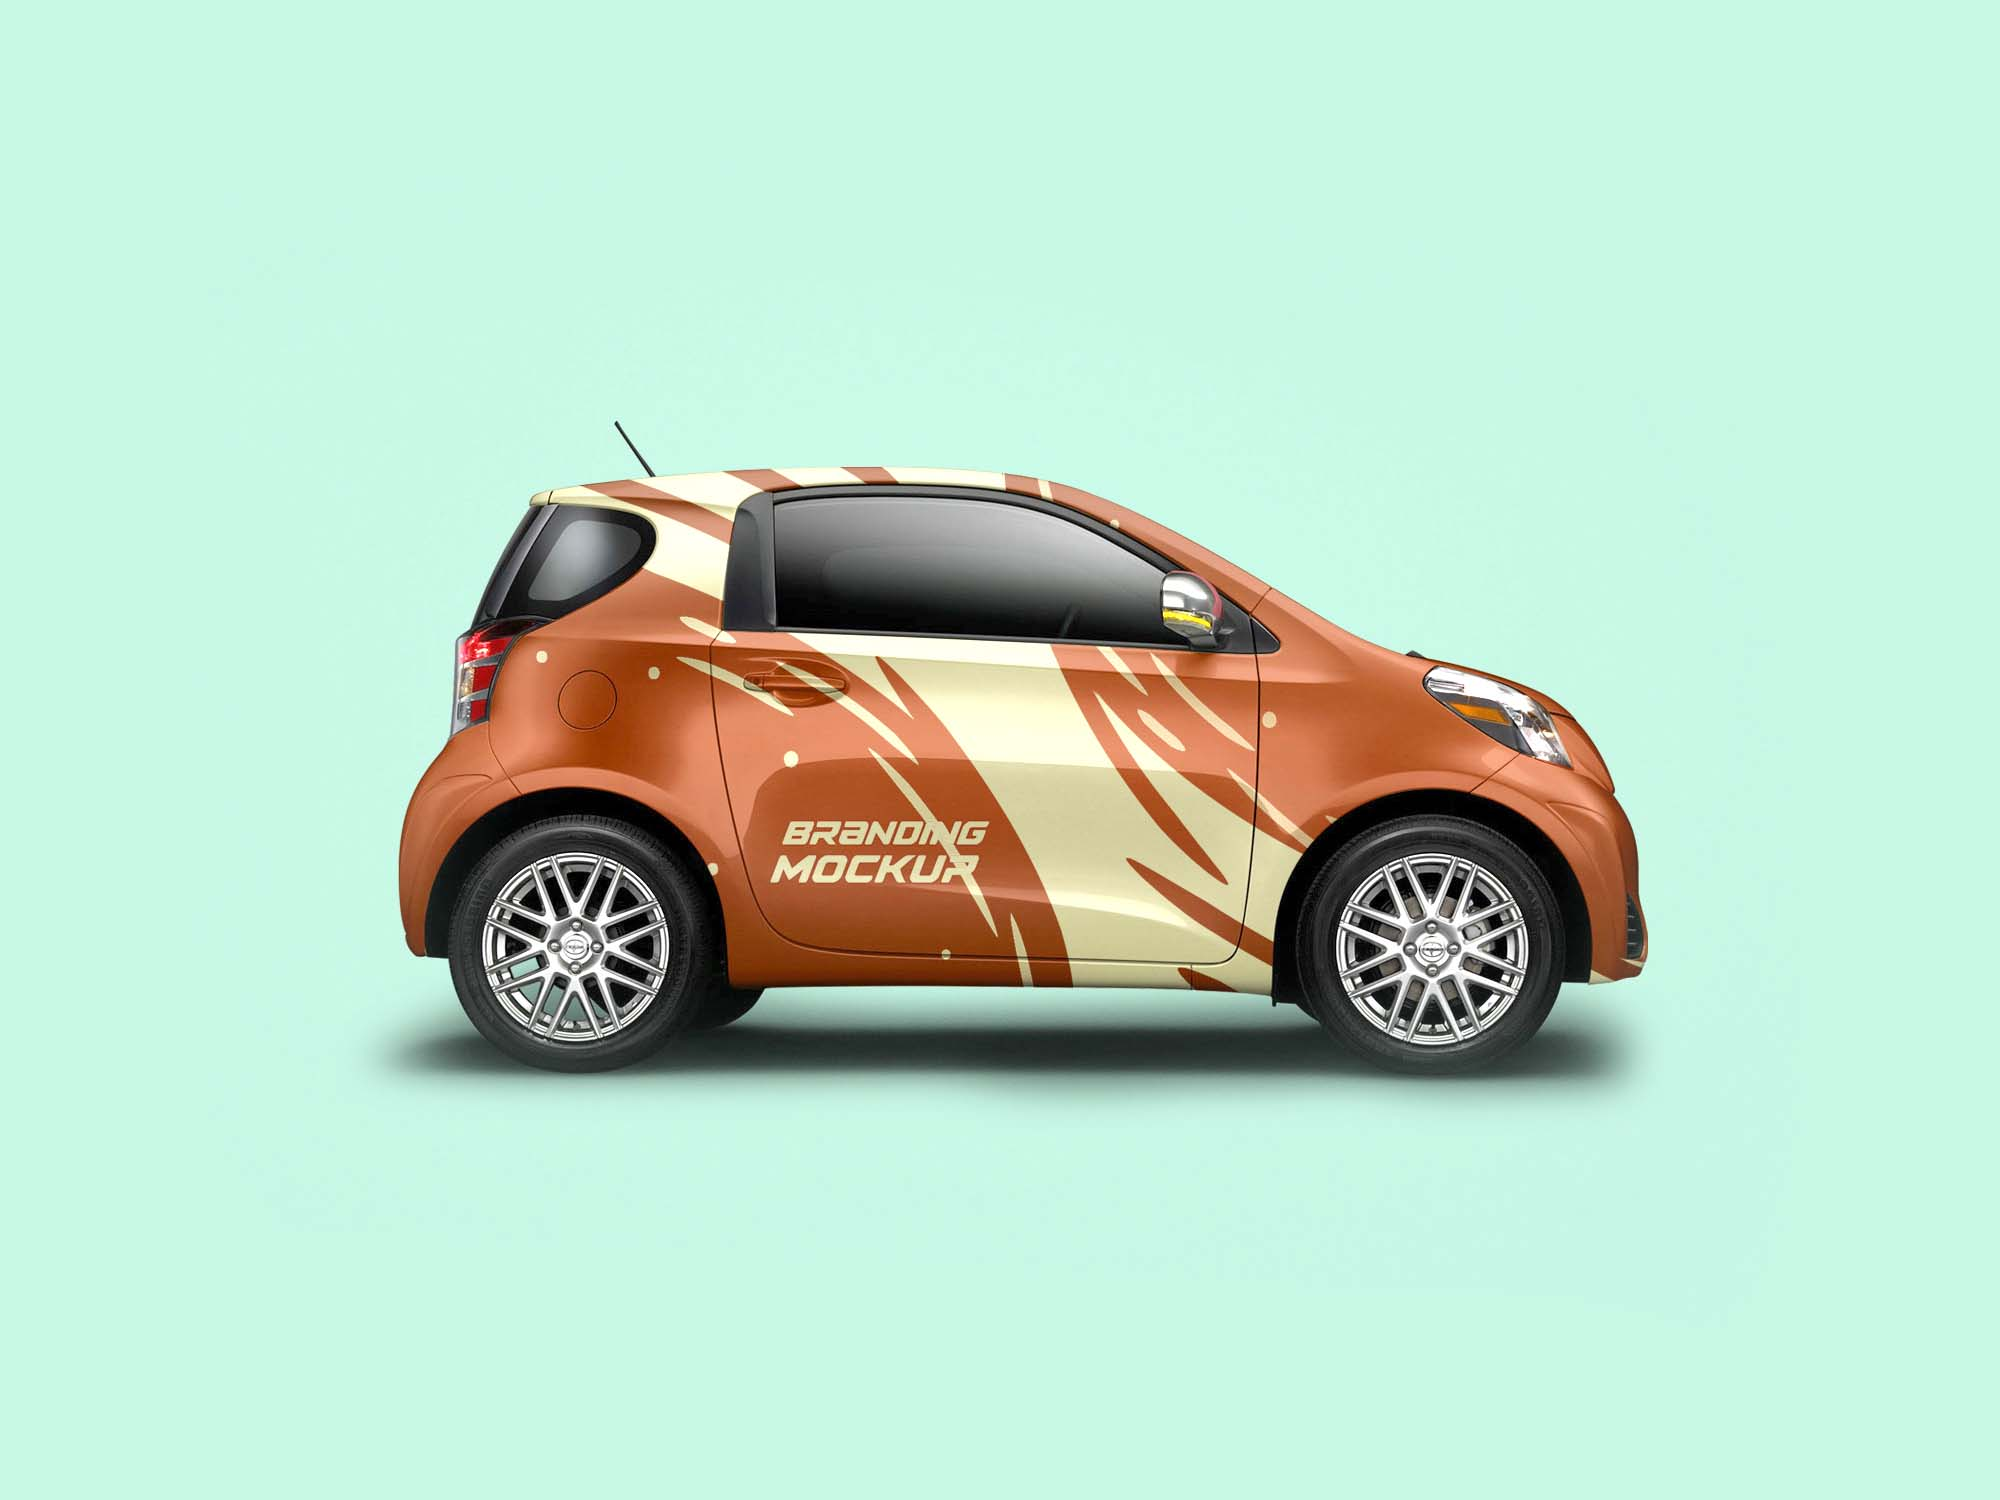 Mini Electric Car Branding Mockup